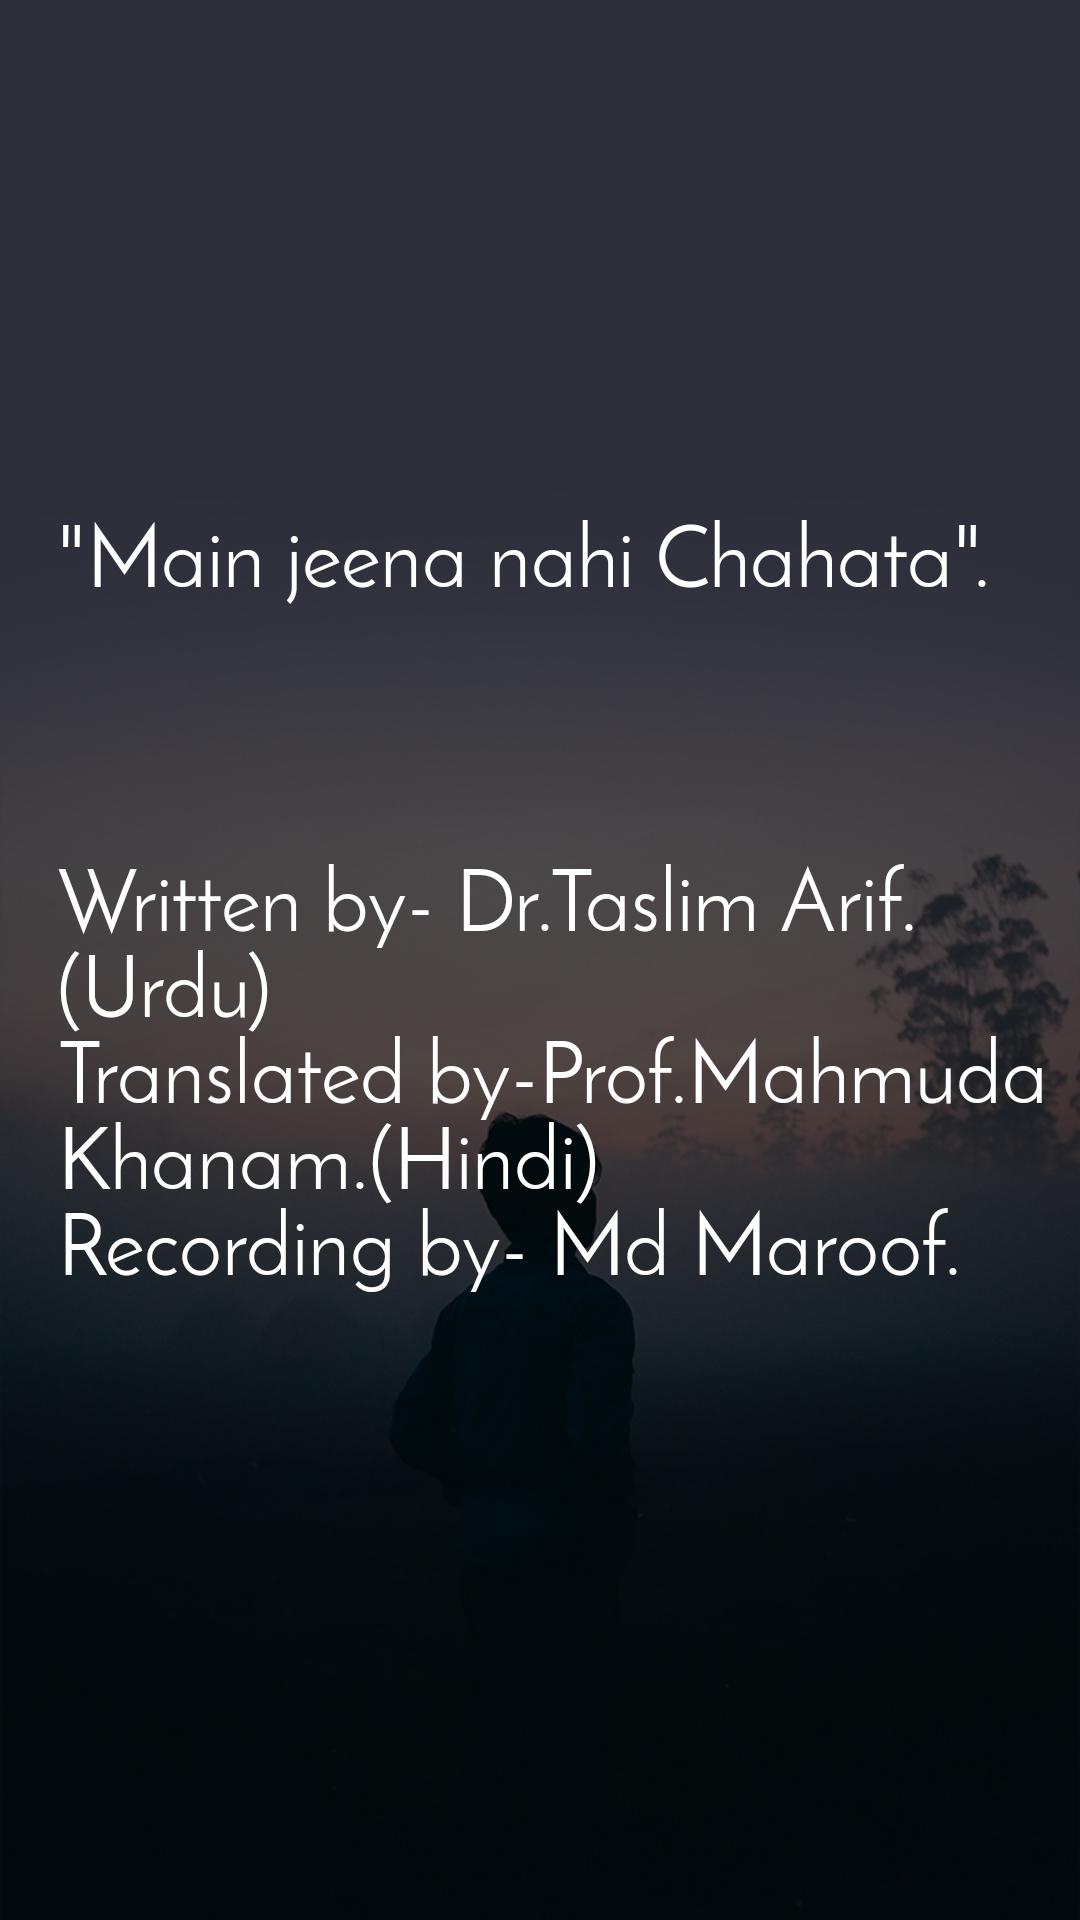 """Main jeena nahi Chahata"".    Written by- Dr.Taslim Arif.(Urdu) Translated by-Prof.Mahmuda Khanam.(Hindi) Recording by- Md Maroof."